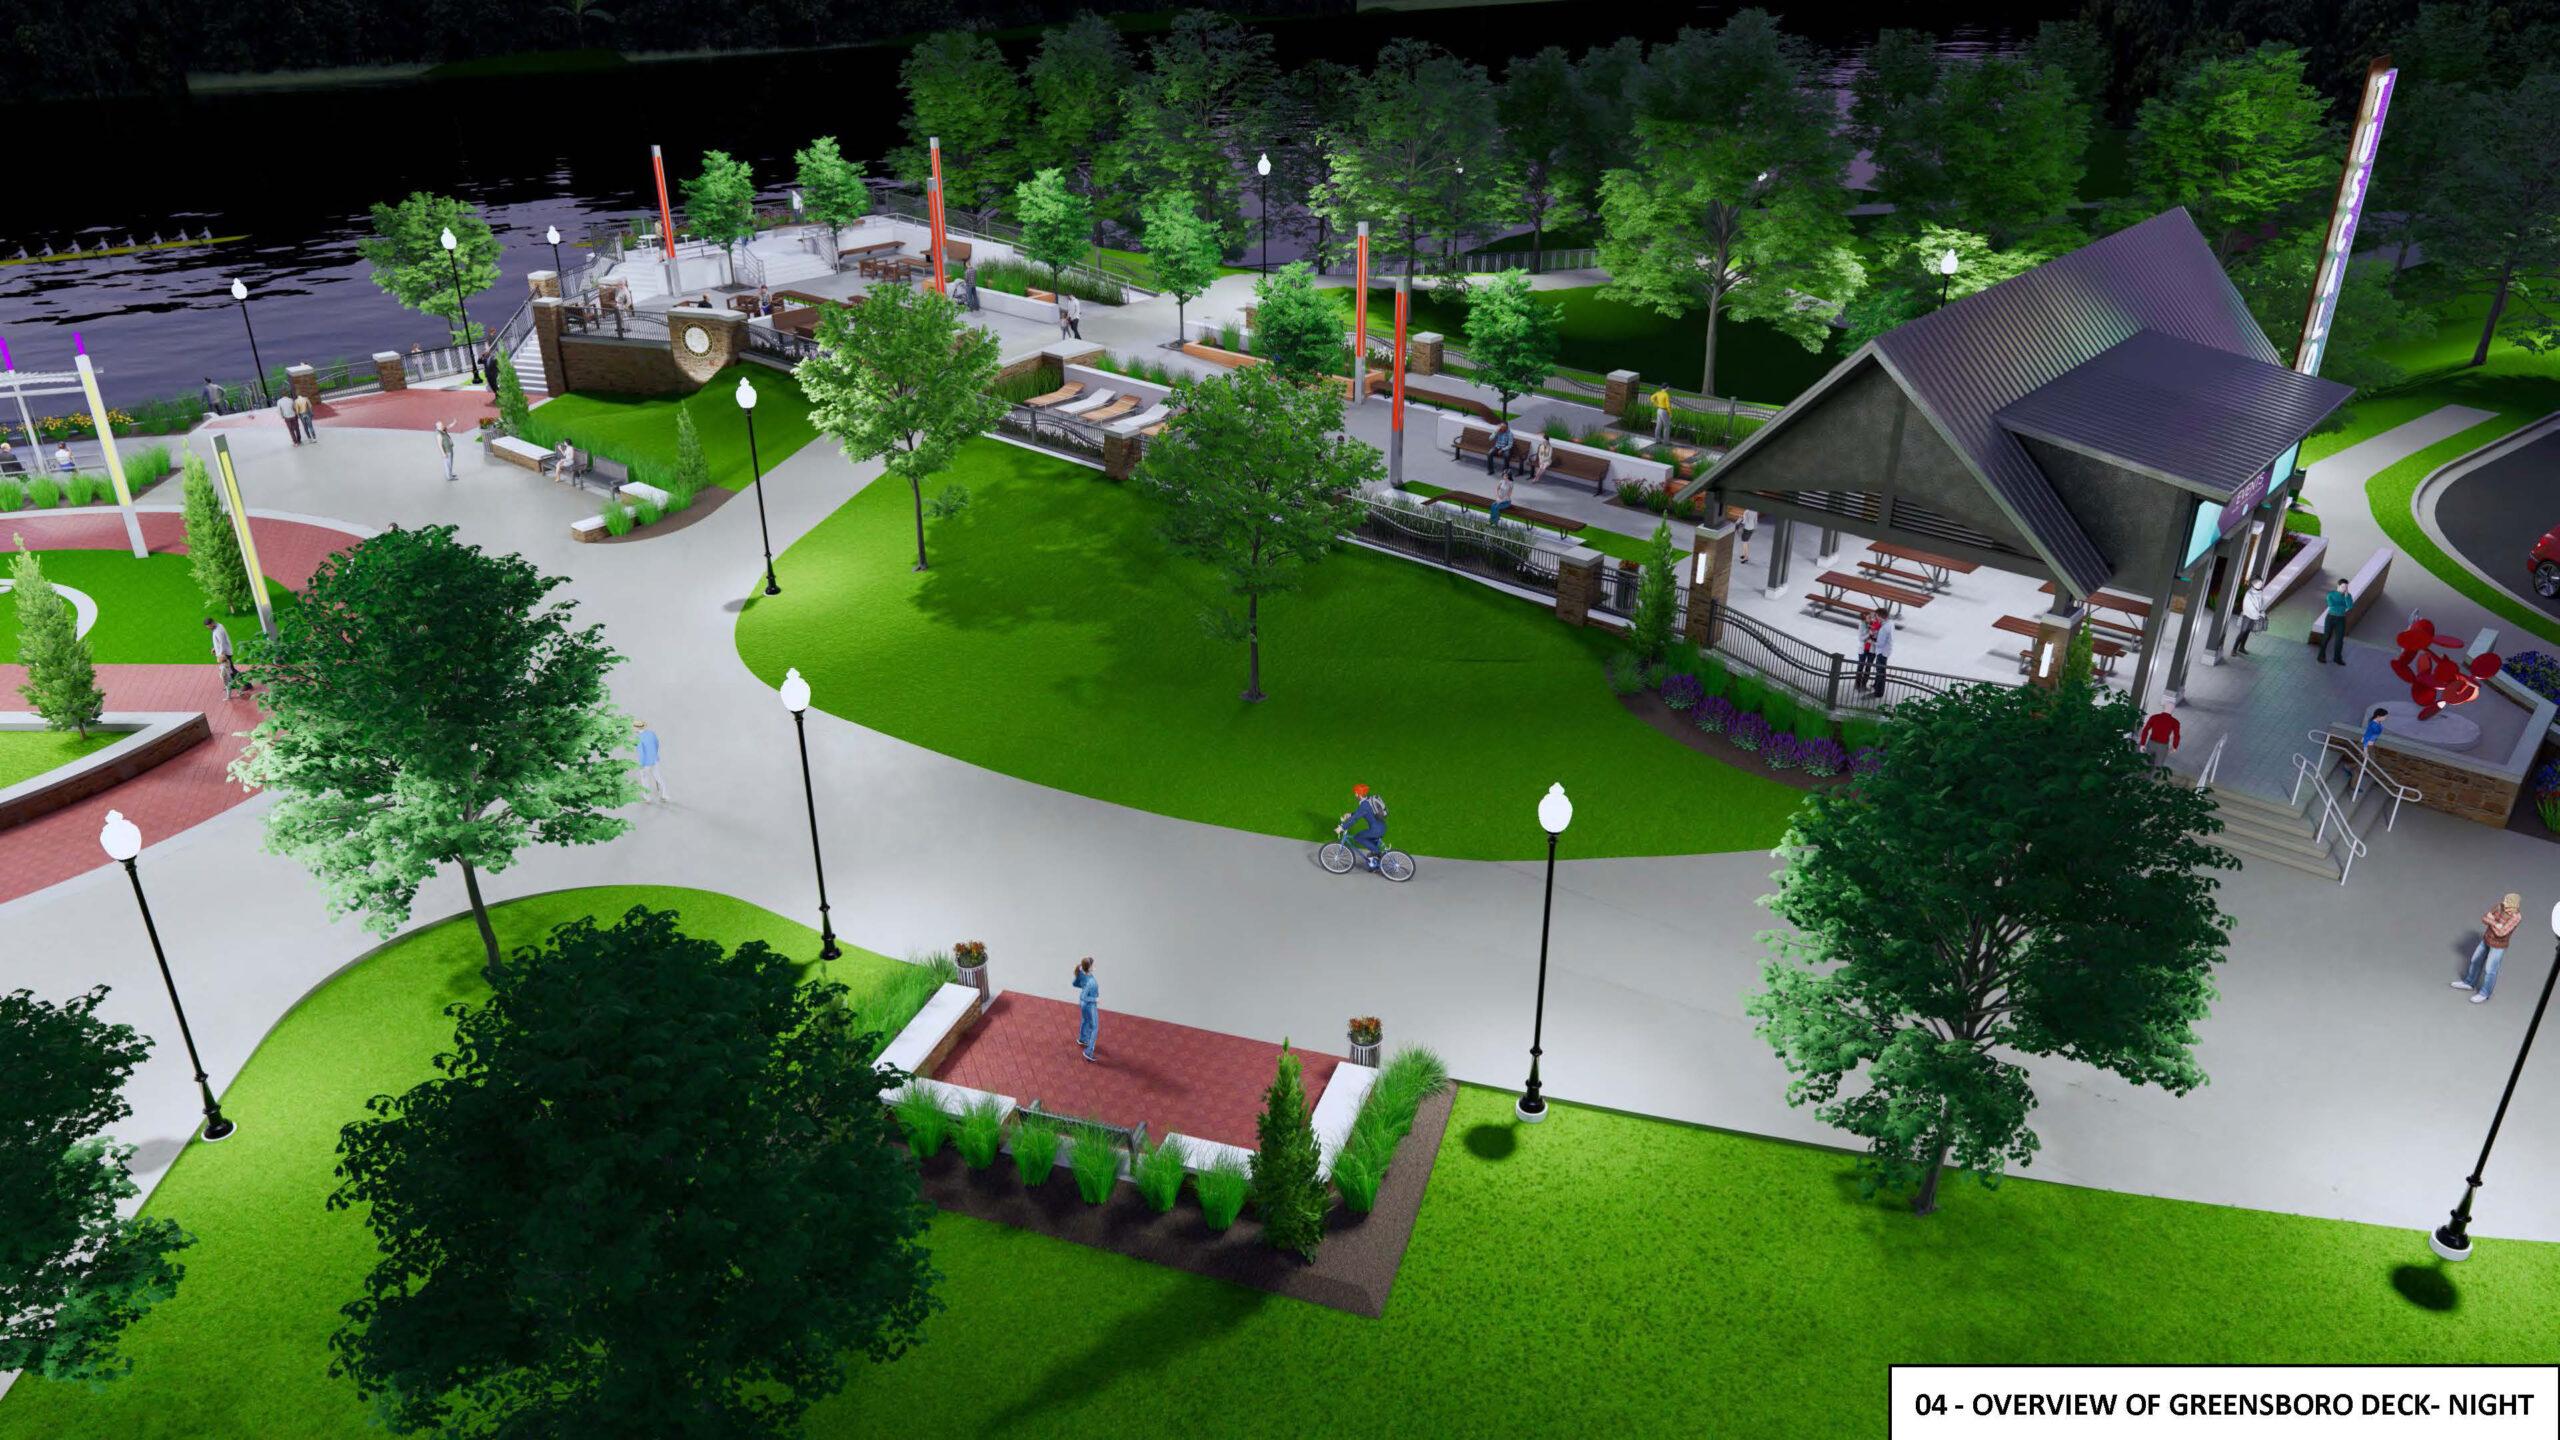 River-District-Park-Greensboro-Deck